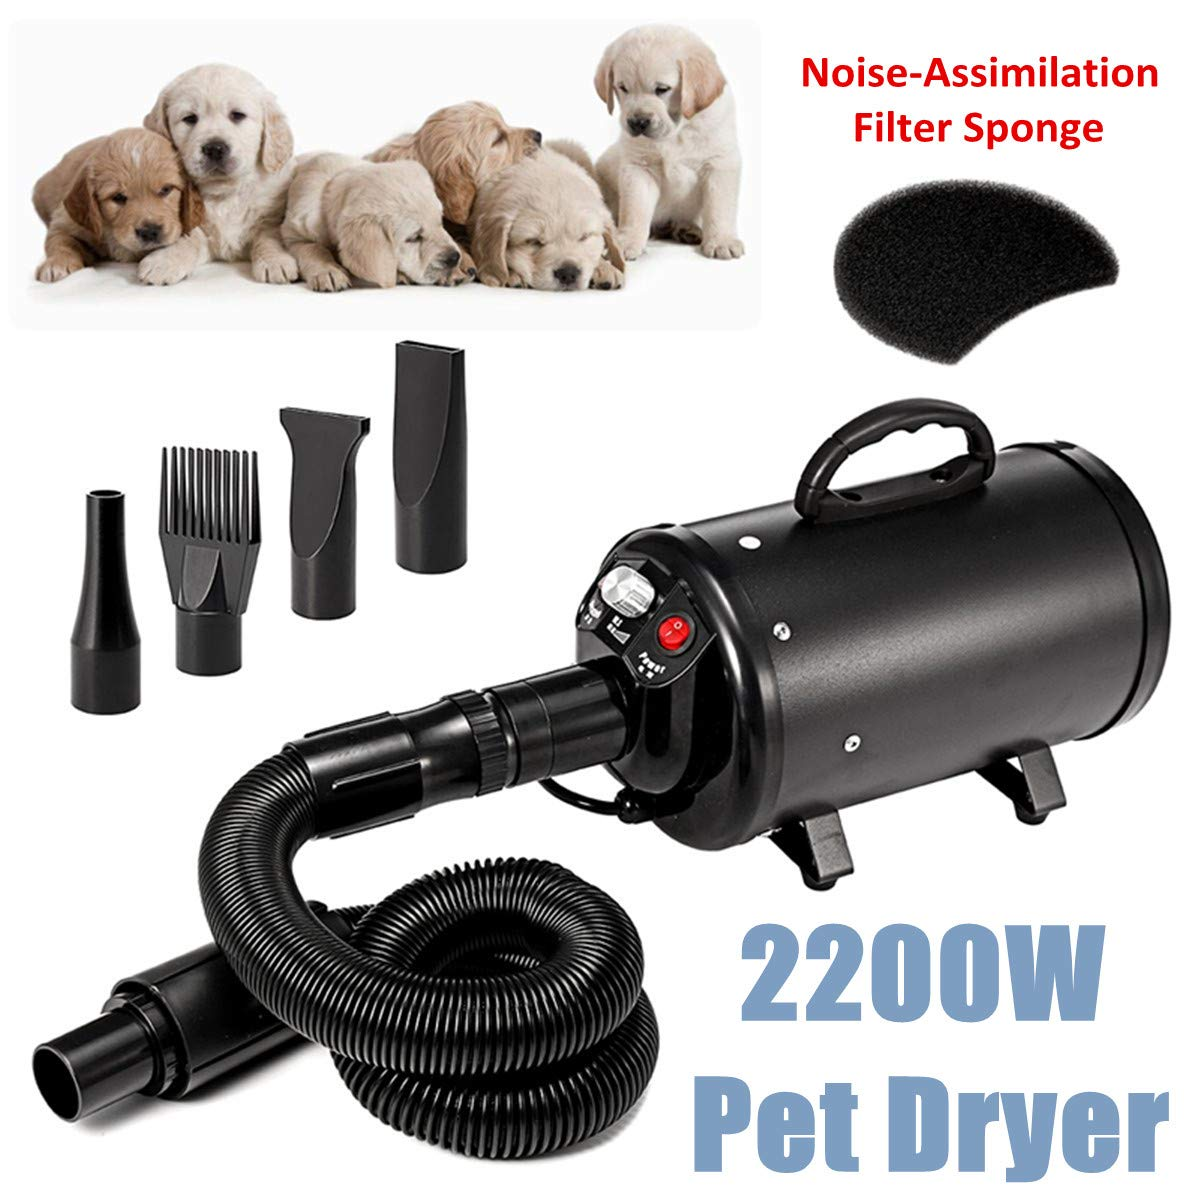 Dog Grooming Dryer Pet Dog Hair Dryers Blower Waterproof Low Noise Stepless Wind Speed 120V 2800W